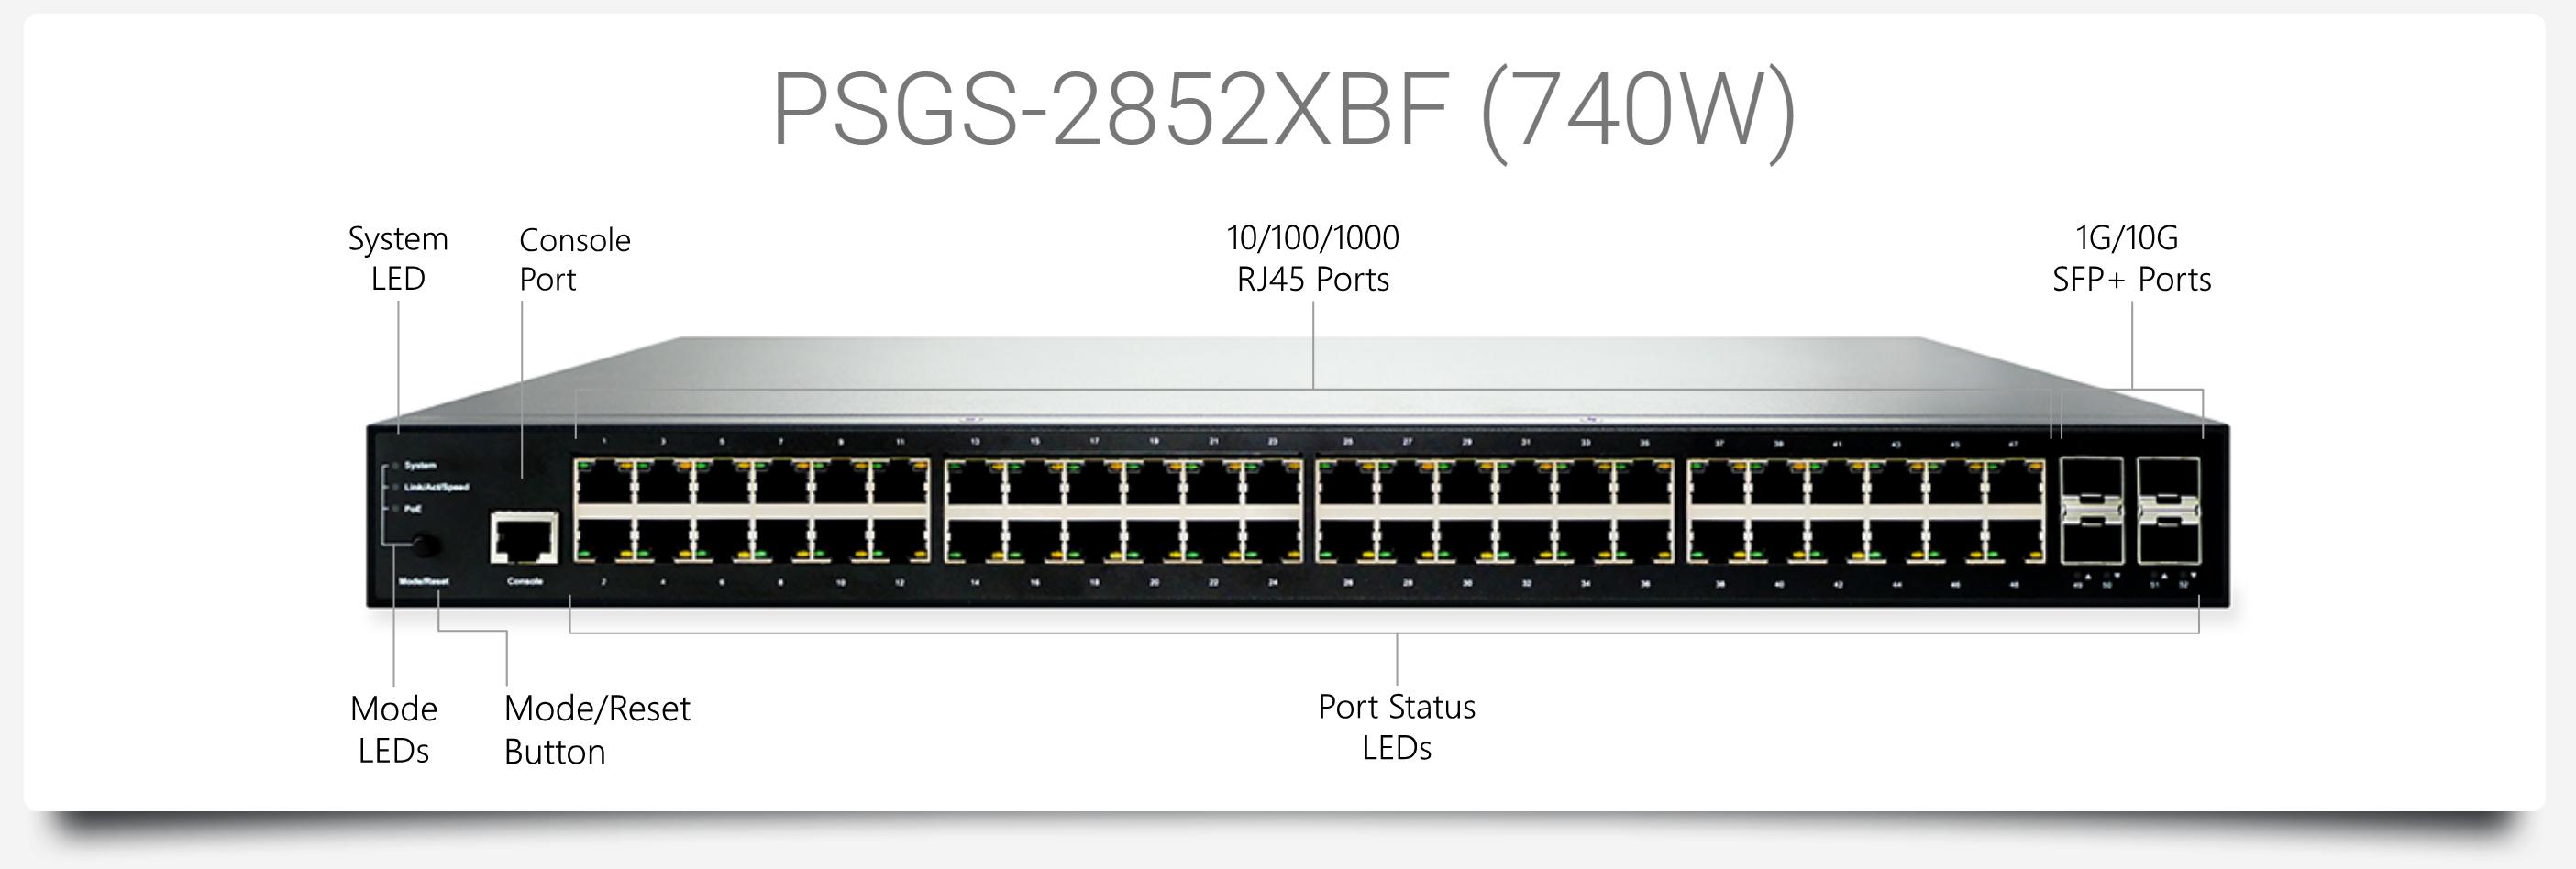 PSGS-2852XBF